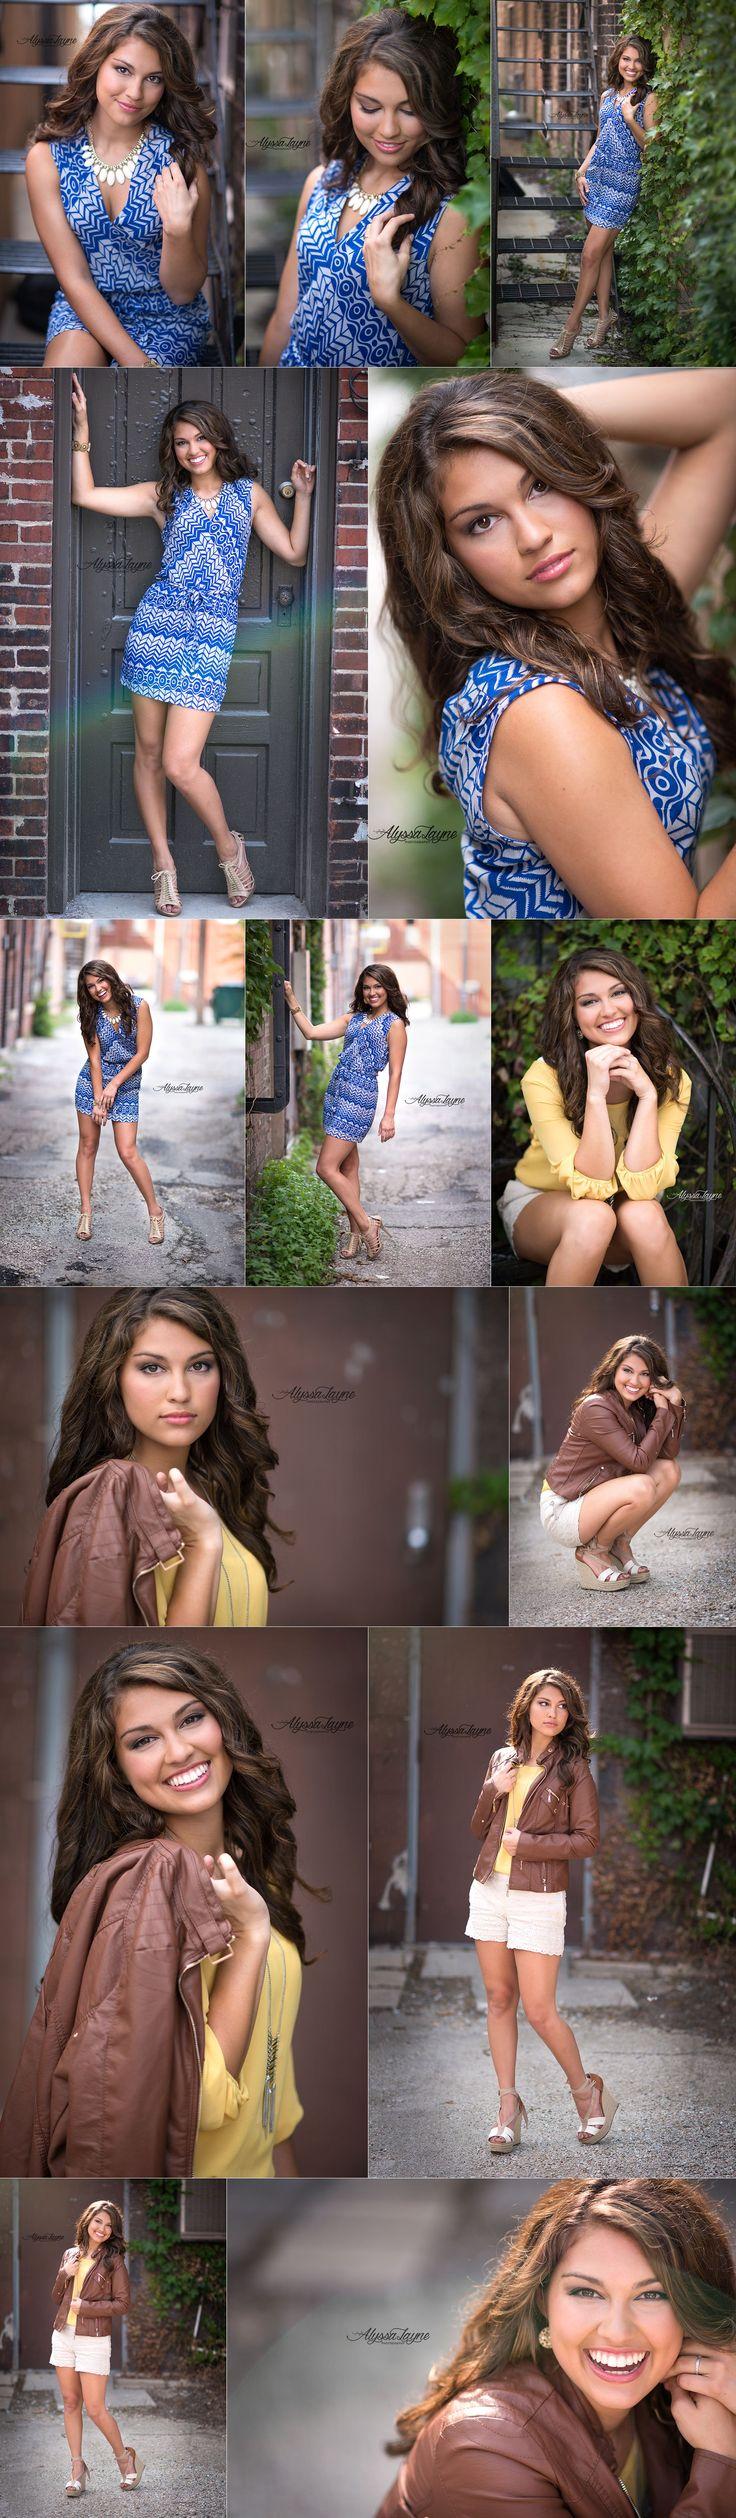 Senior Pictures | Jessica | Senior Pose | Illinois Senior Pictures | Alyssa Layne Photography